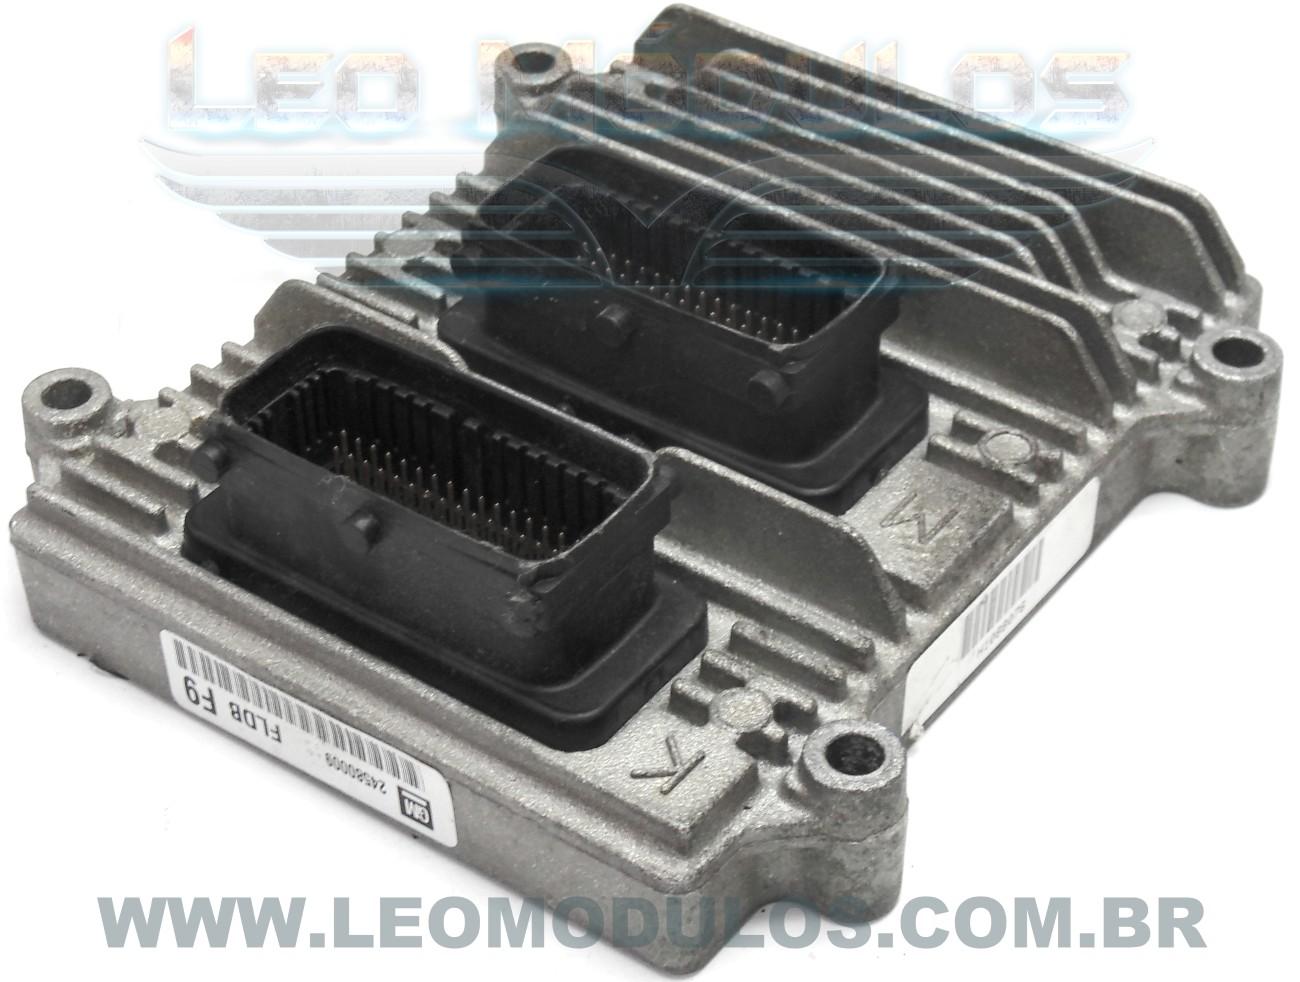 Módulo de injeção multec HSFI 2.3 - FLDB F9 24580009 - Chevrolet Corsa Classic 1.0 Flex VHCE - FLDB F9 - Leo Módulos